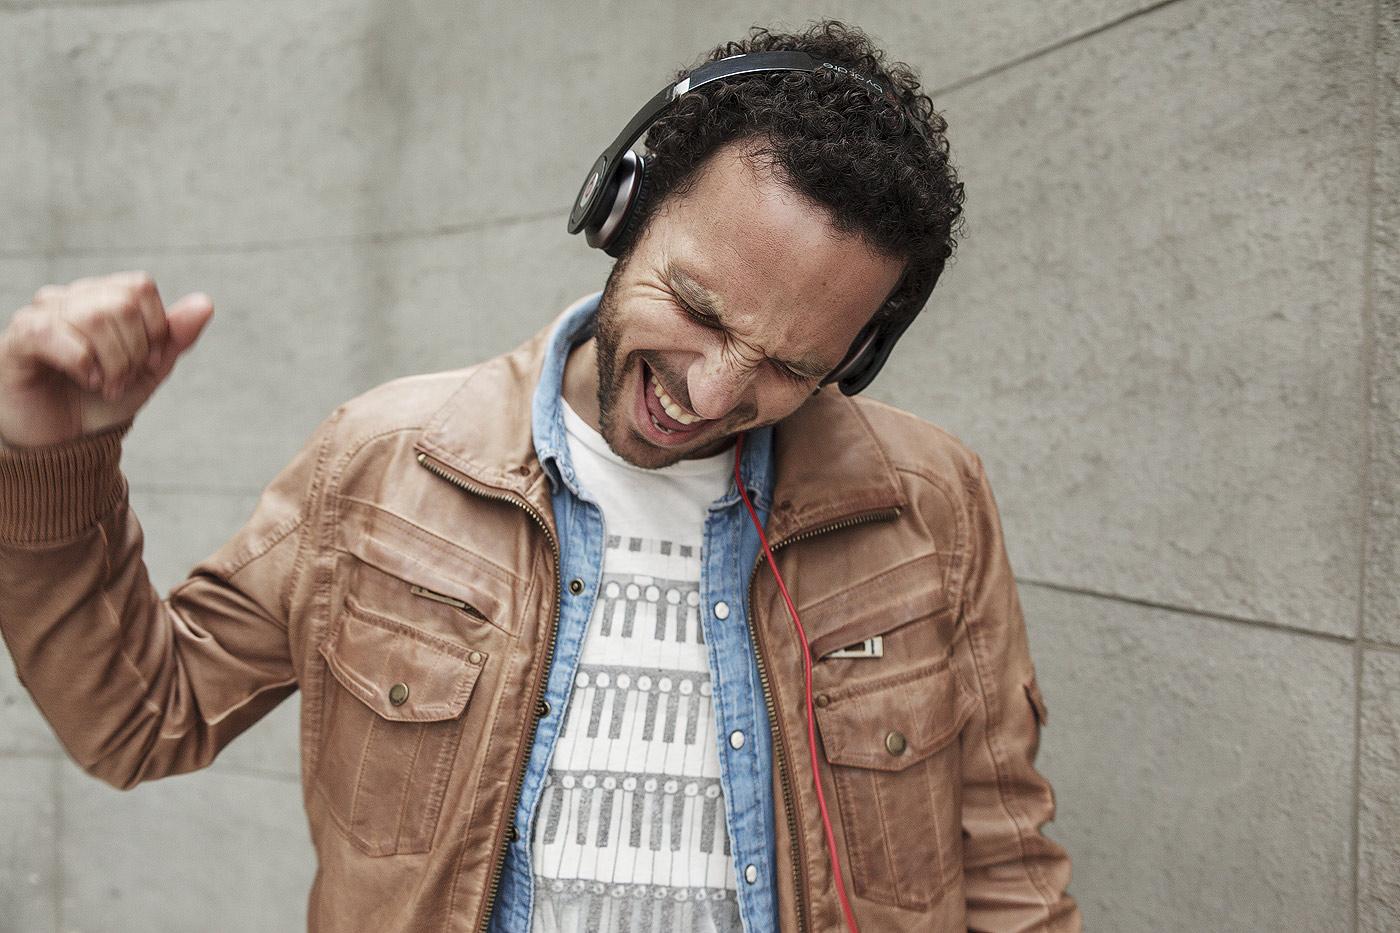 typ-headphones-musik